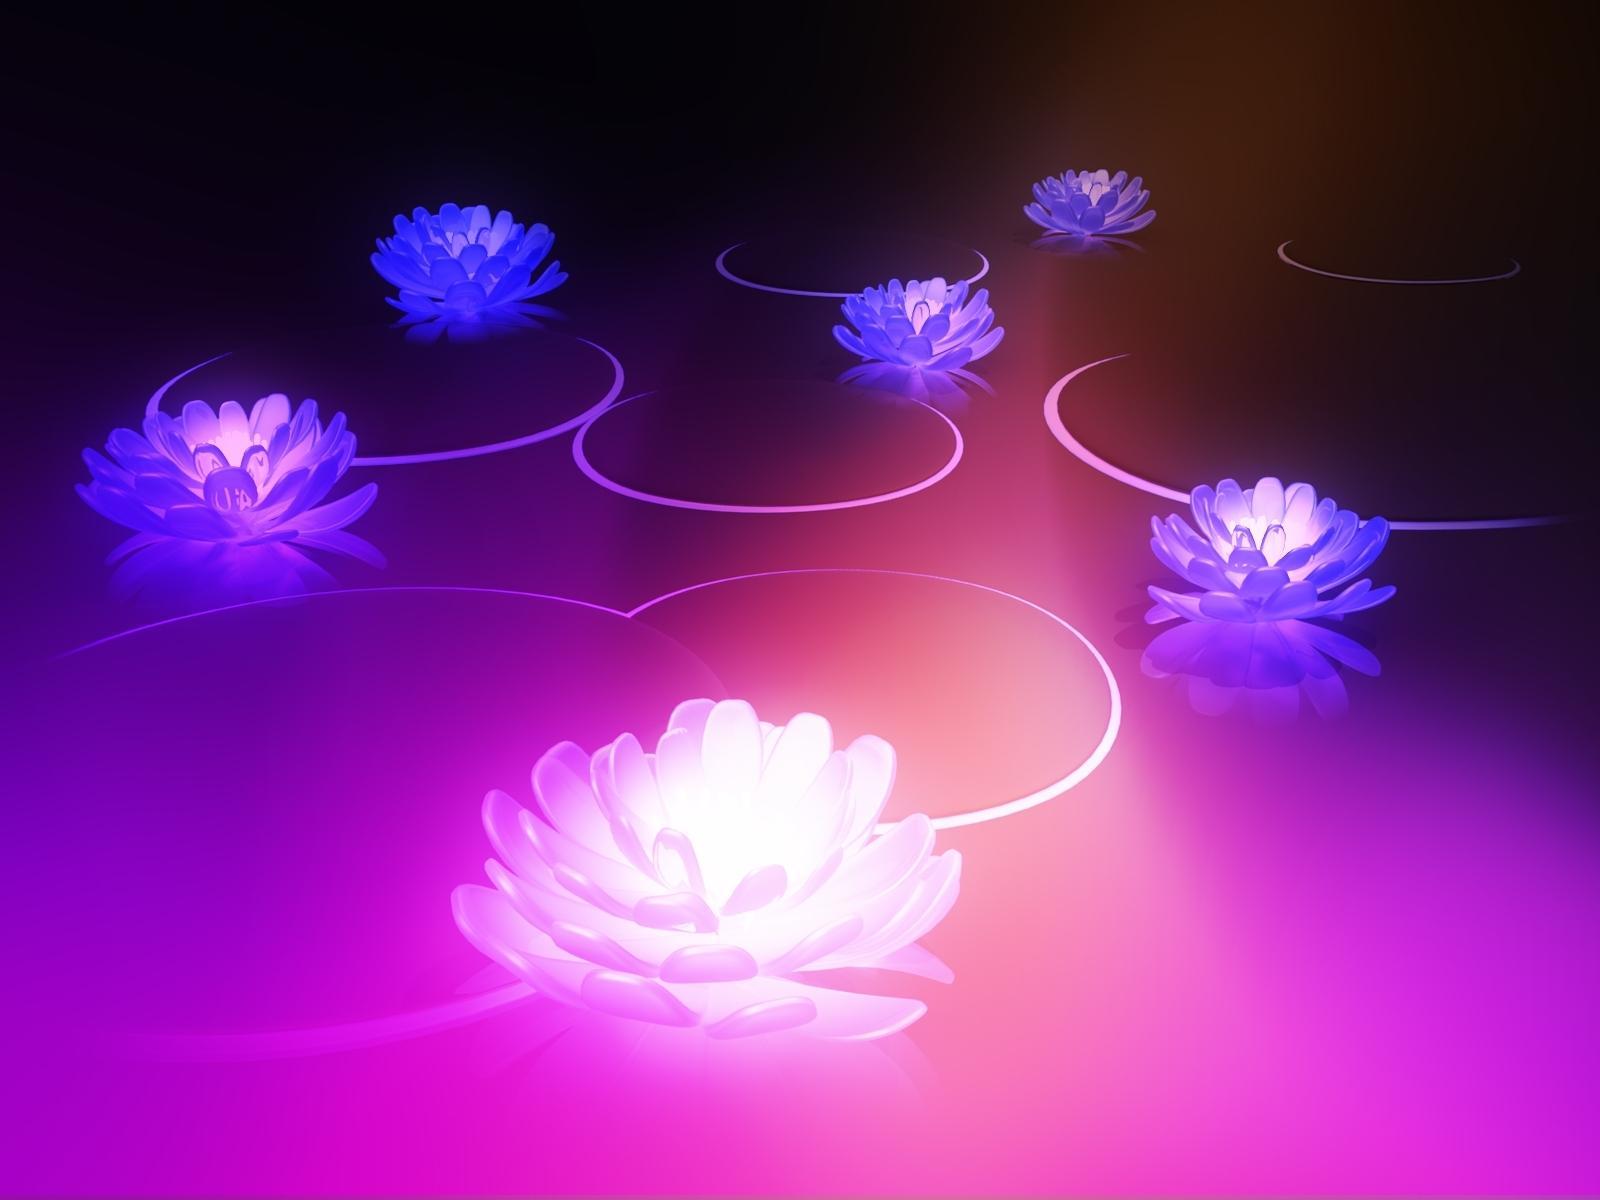 cool lotus wallpaper 22587